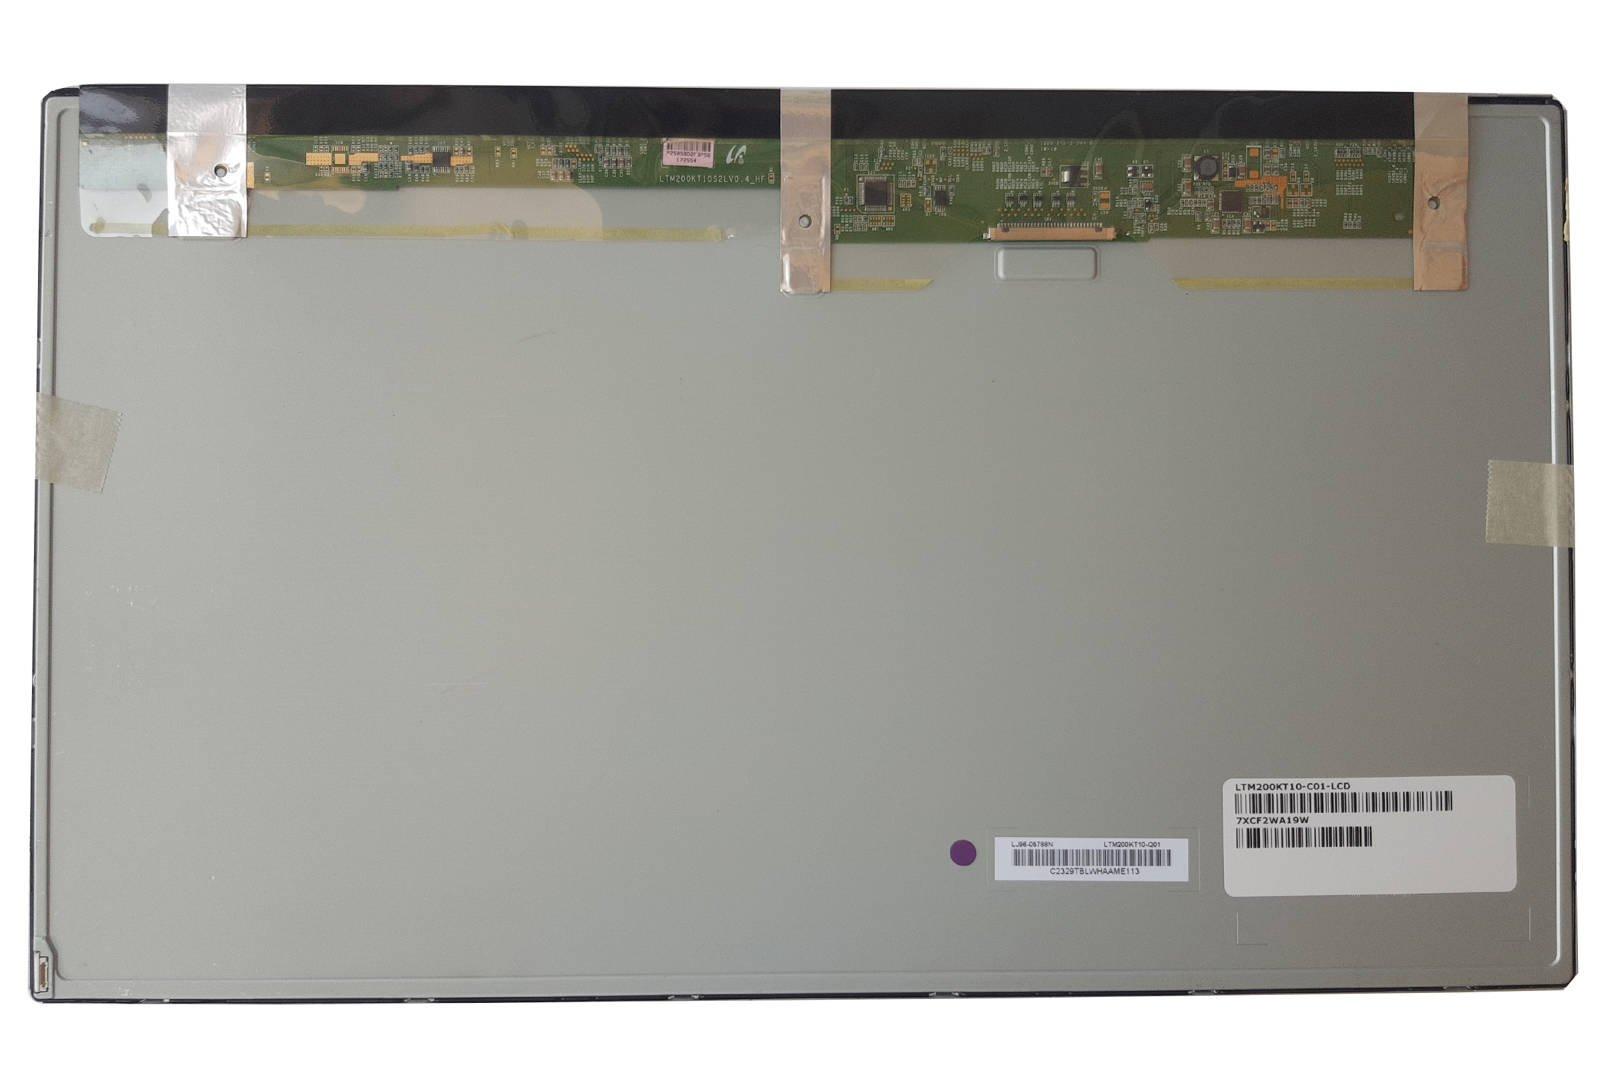 Display Panel Screen Samsung 20' LTM200KT10 1600 x 900